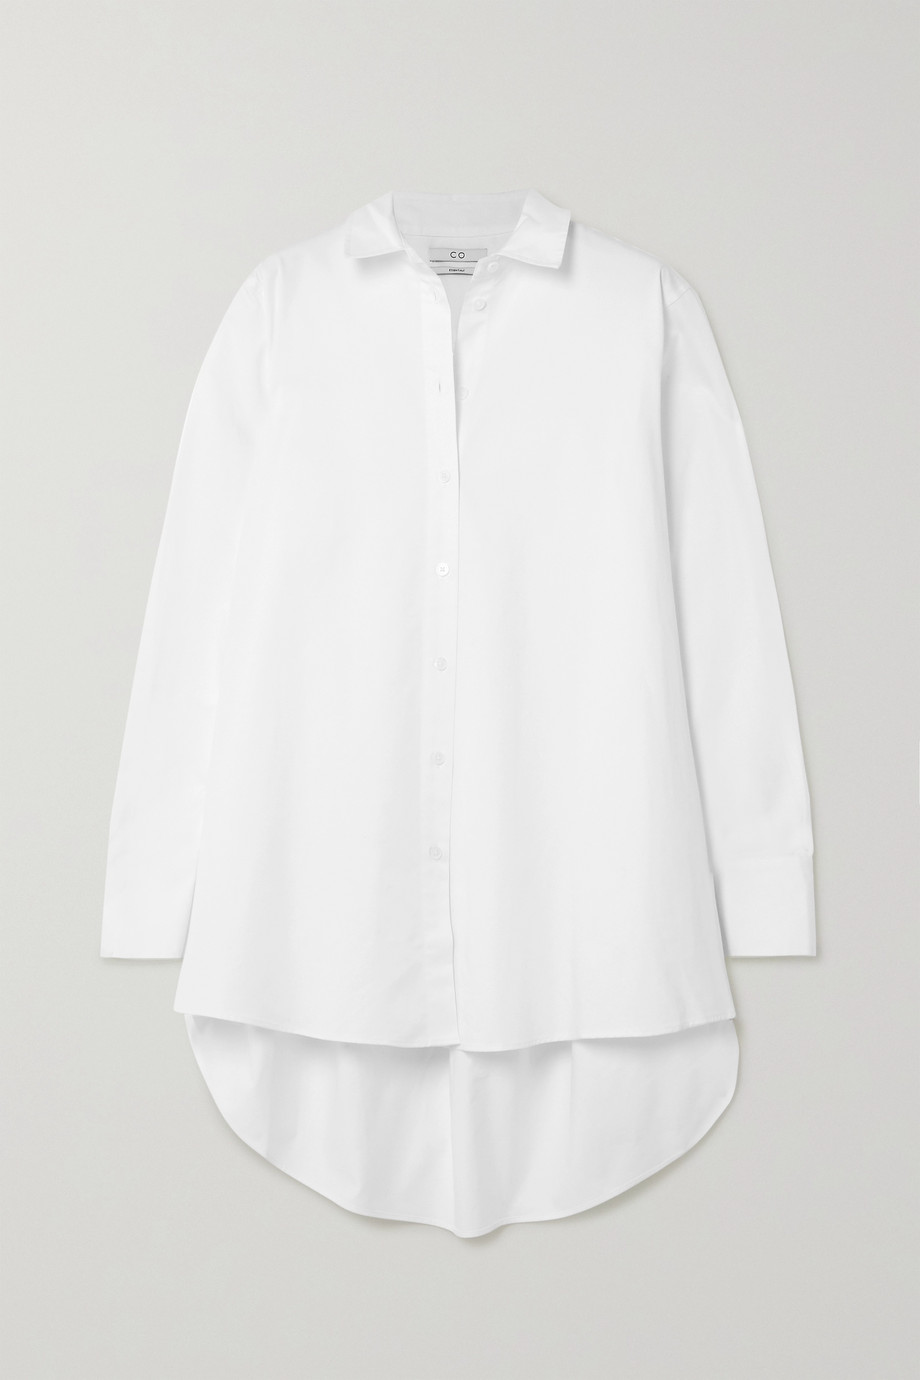 Co Cotton-poplin shirt